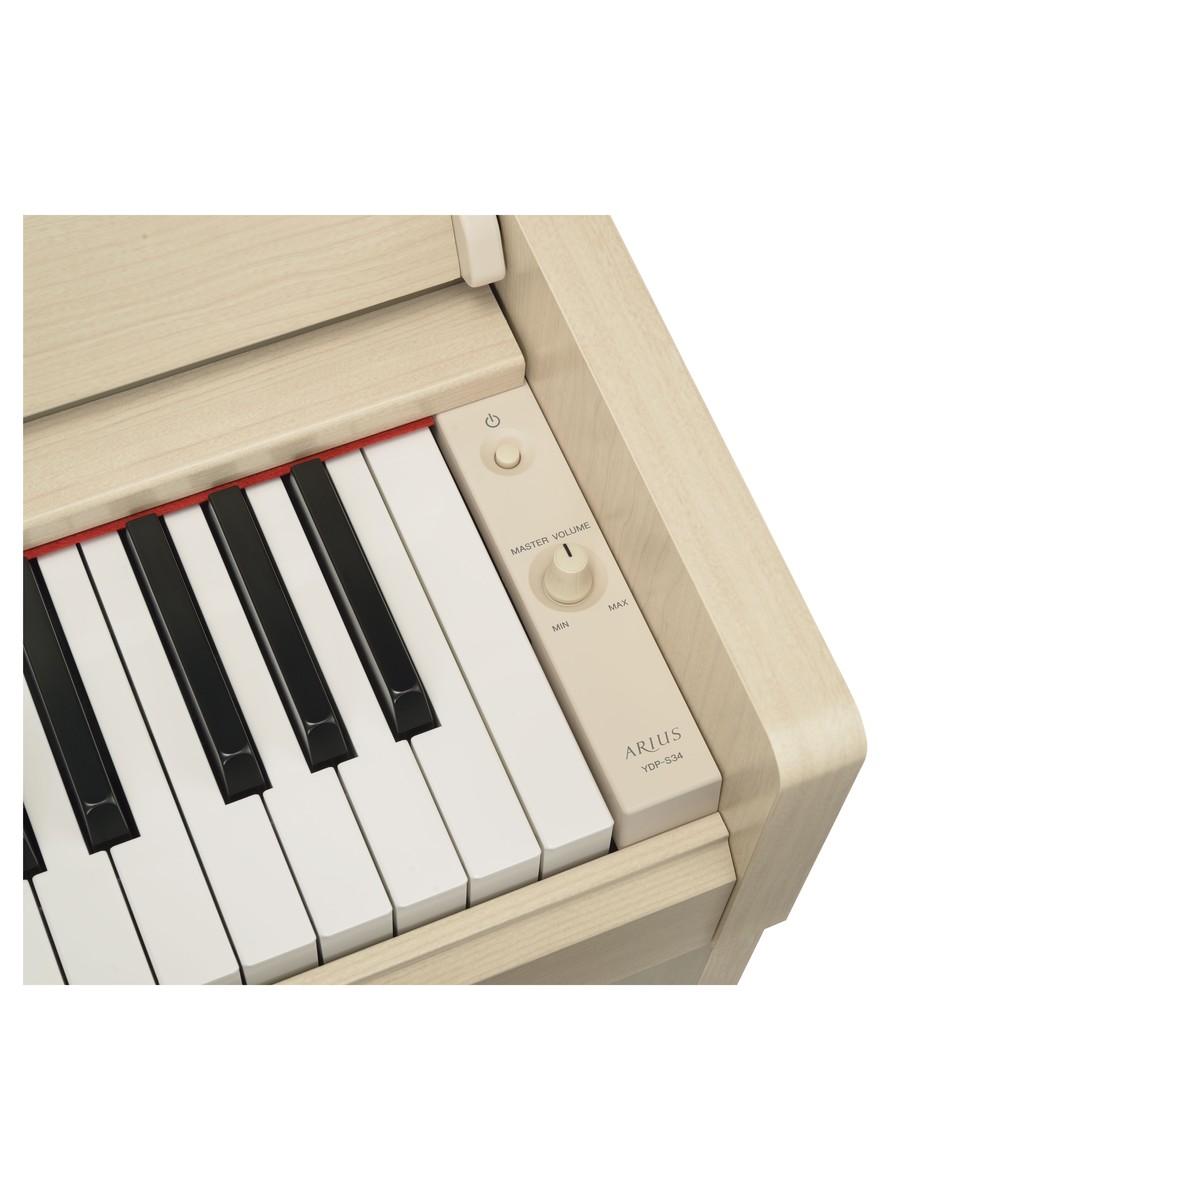 yamaha ydp s34 digitalpiano wei e esche gear4music. Black Bedroom Furniture Sets. Home Design Ideas